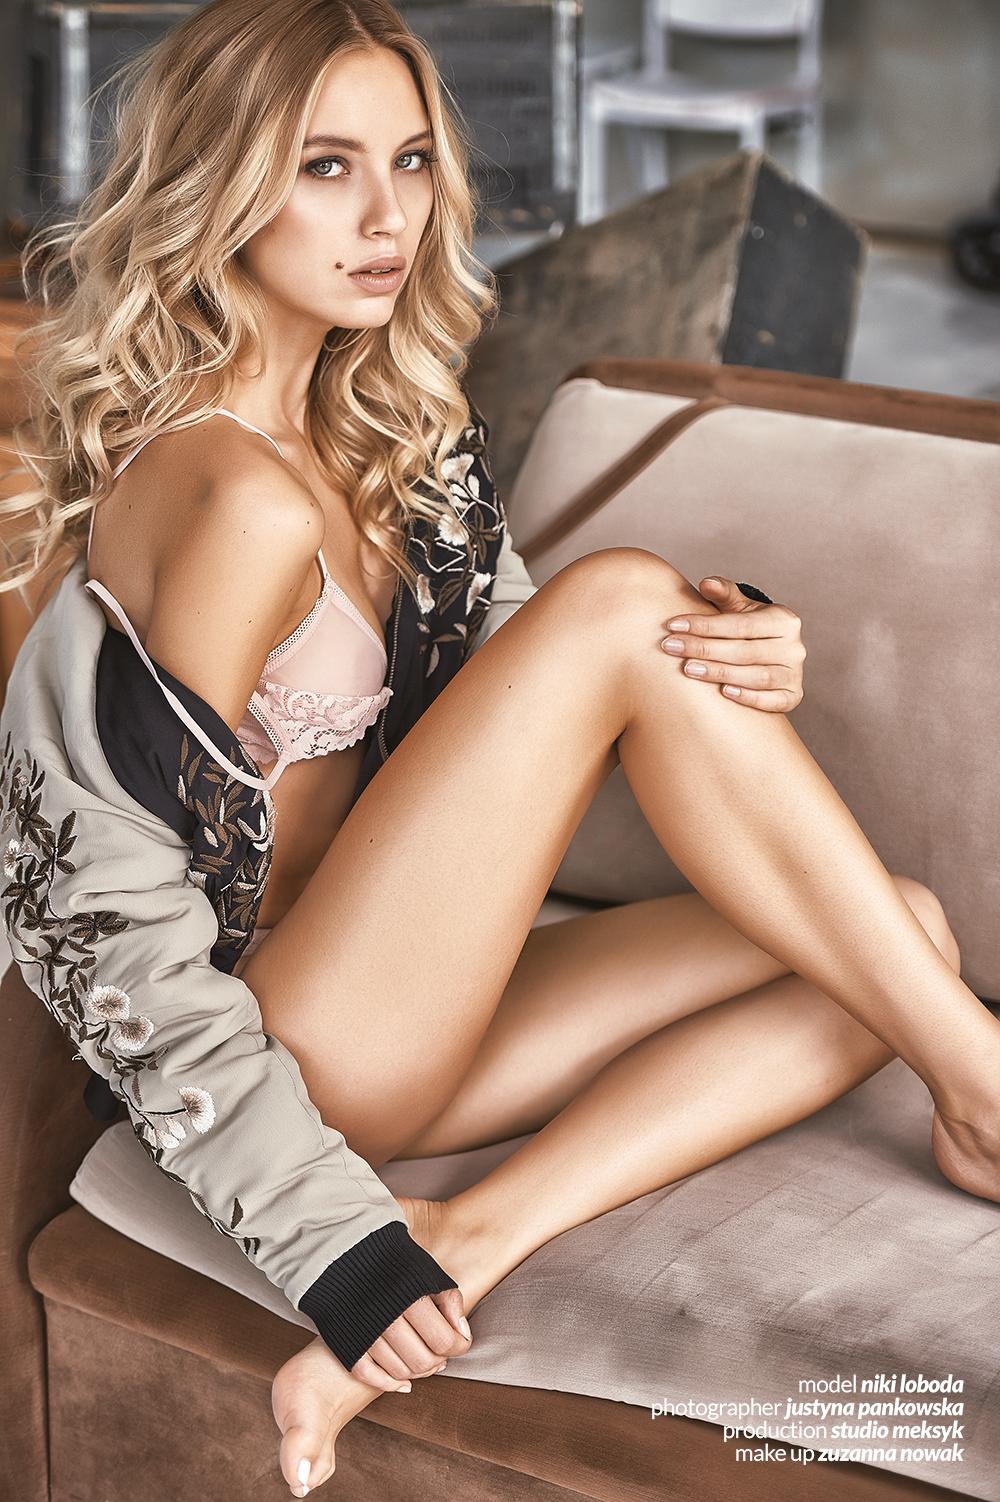 nikki, photo, model, photomodel, session, retouch, photography, portrait, shoot, fashion, magazine, press, sexy girl, blonde, beauty, woman, amazing, lingerie,1.jpg